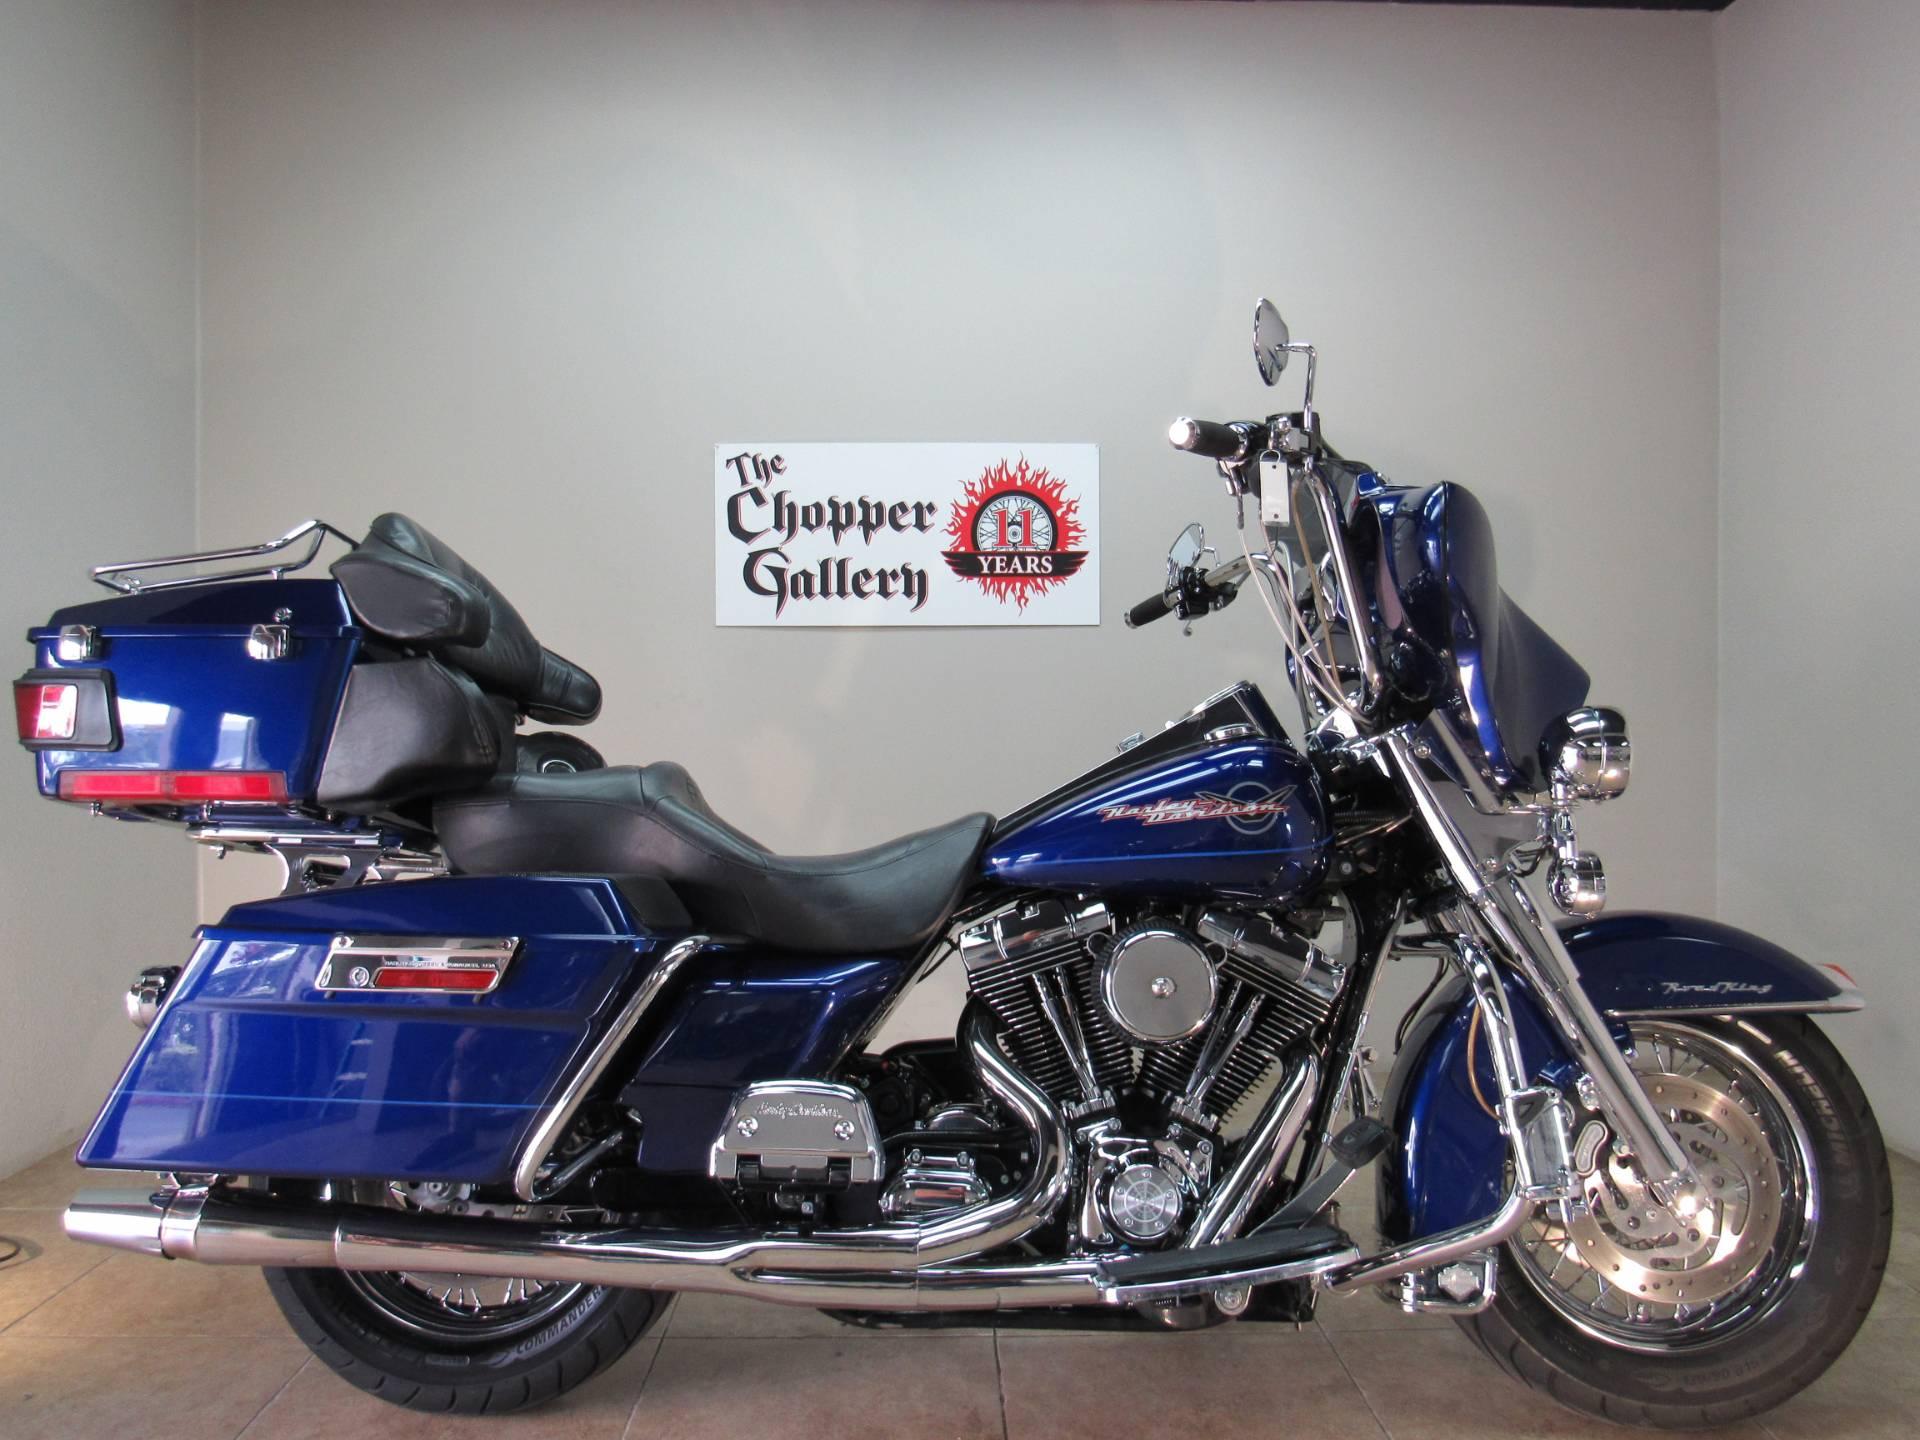 2006 Harley-Davidson Road King® in Temecula, California